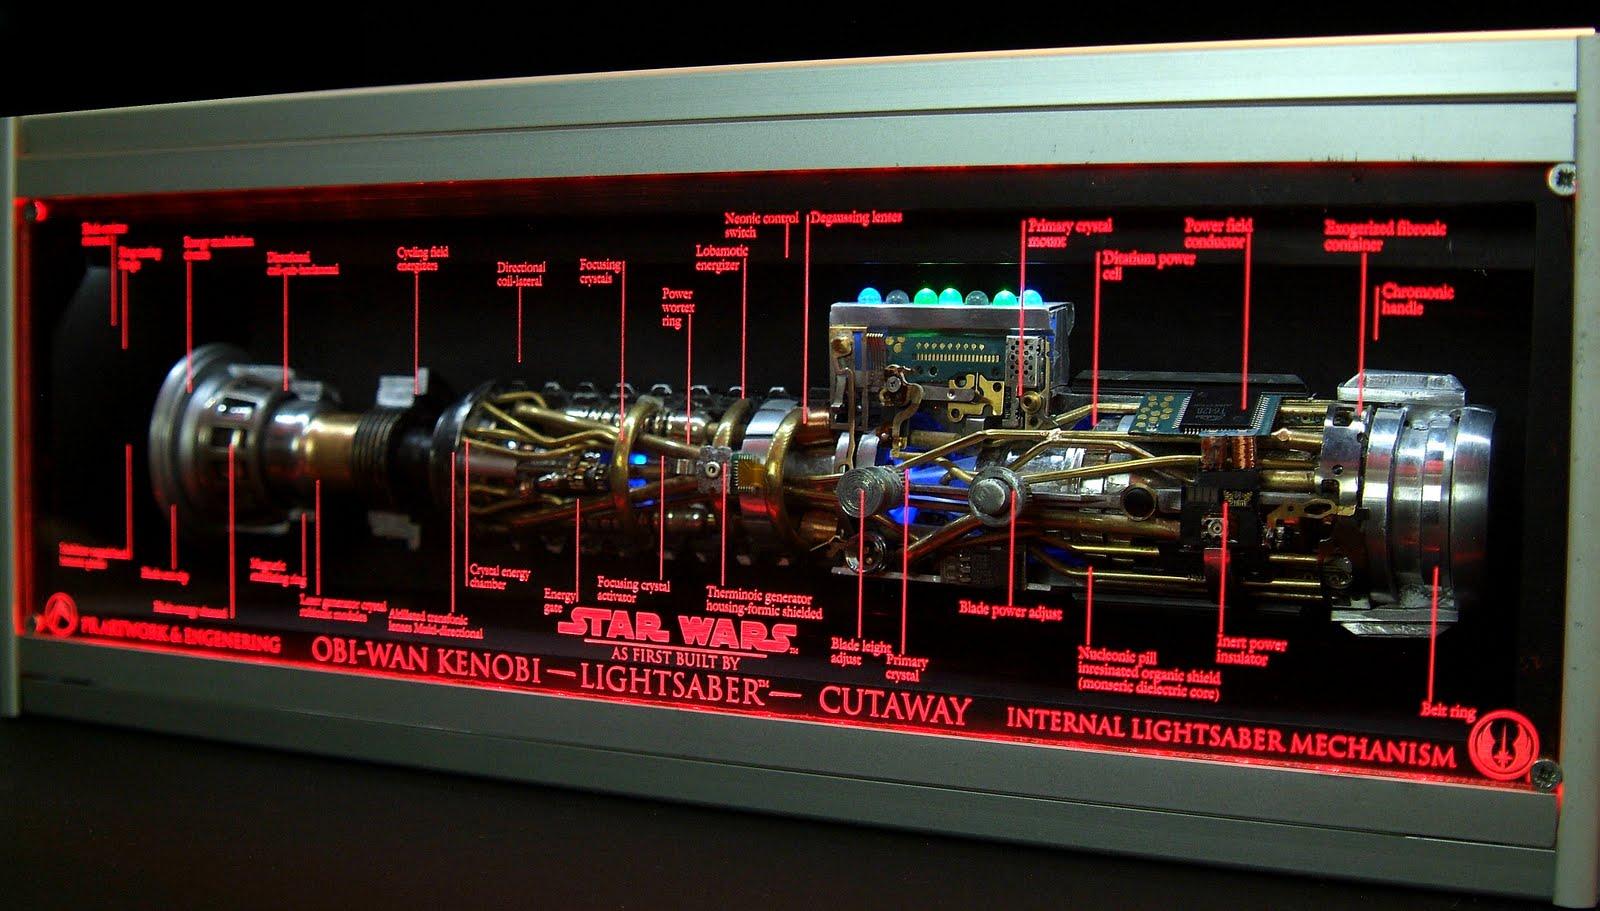 Ro Lightsabers Obi Wan Kenobi Lightsaber Cutaway